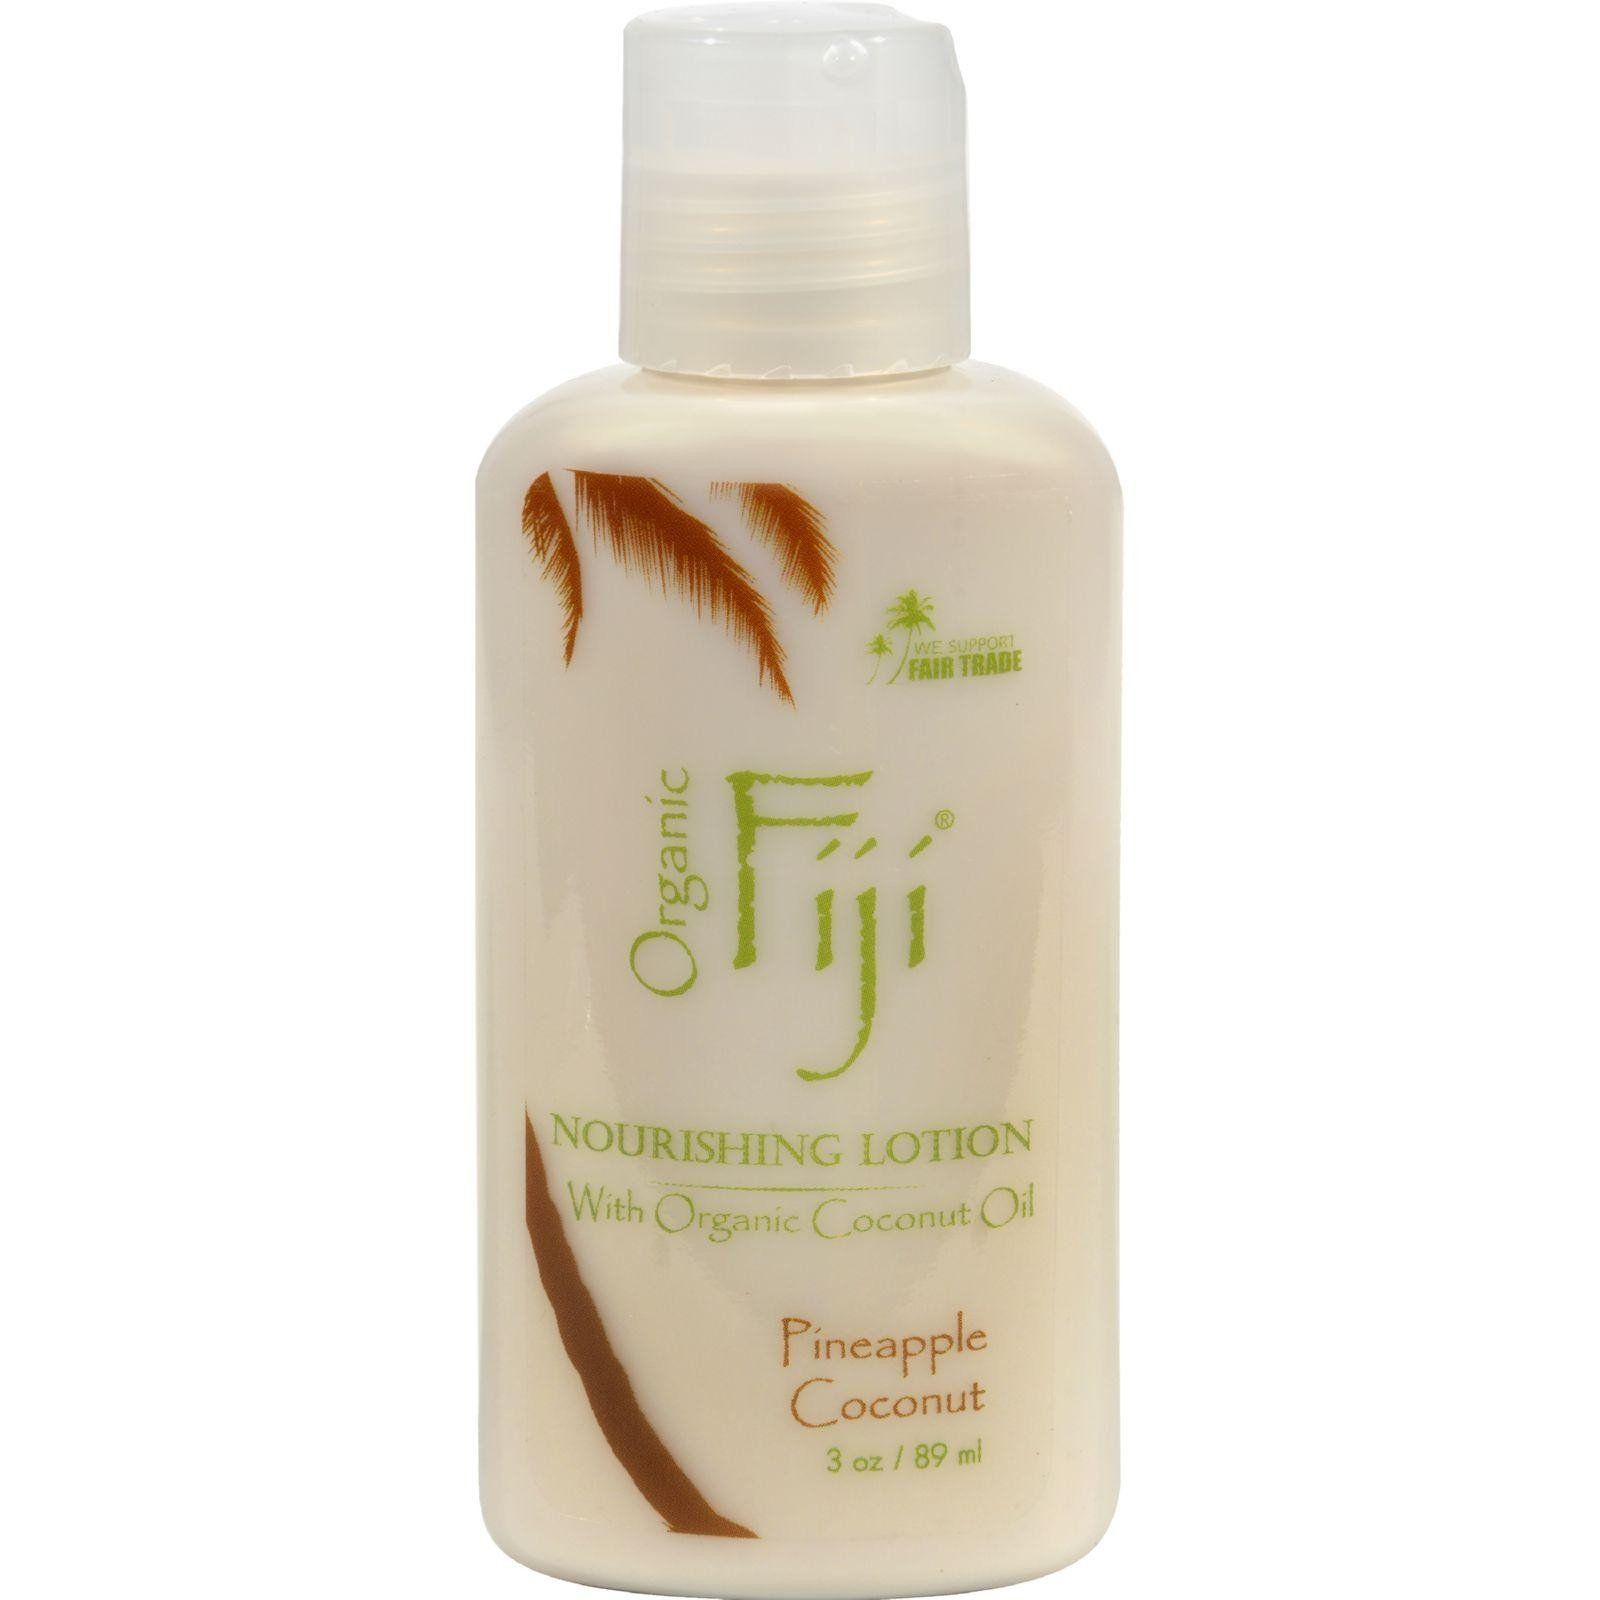 Organic Fiji Coconut Lotion - Pineapple - 3 Oz